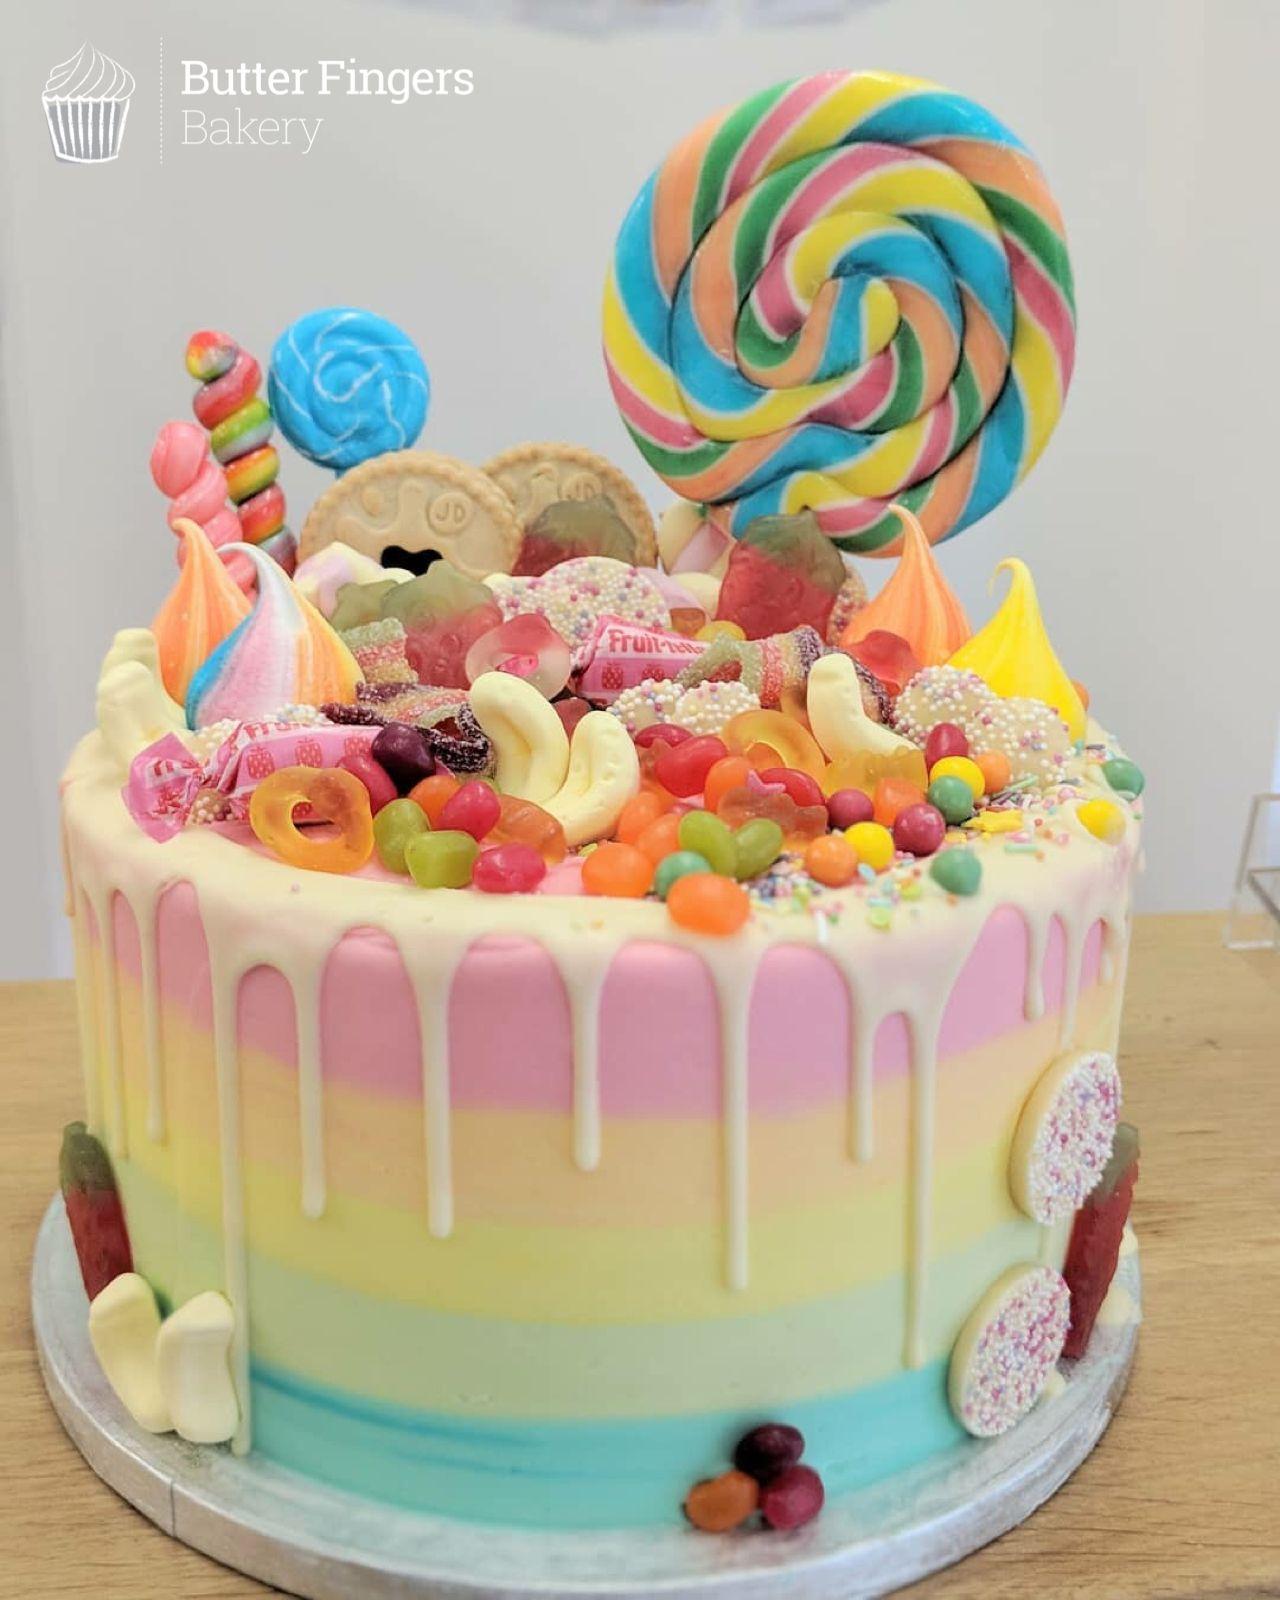 A rainbow buttercream sweetie overload cake cake